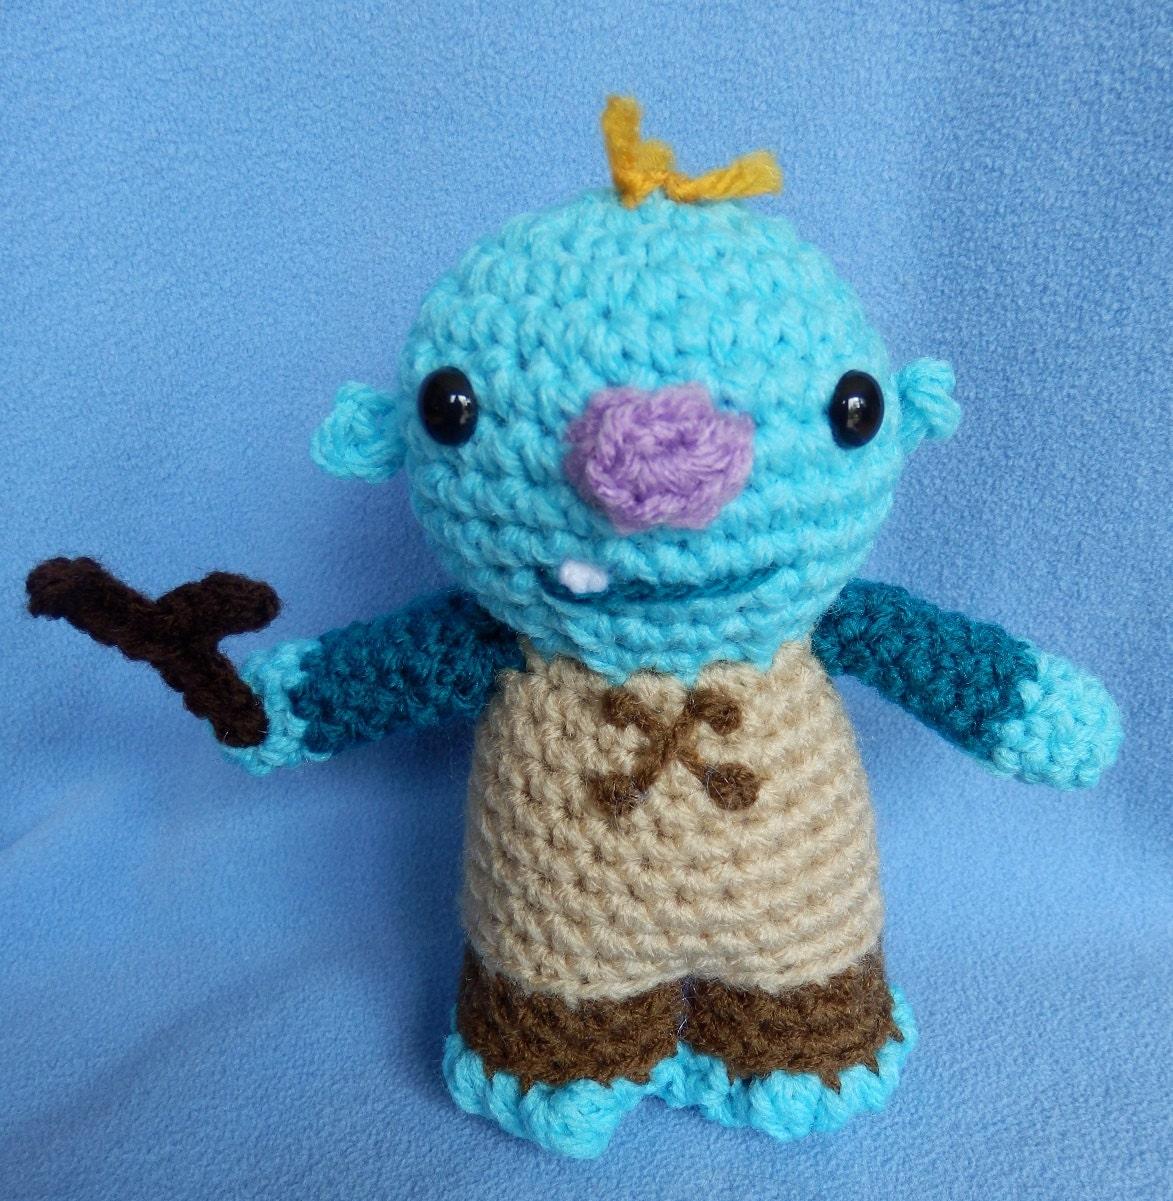 Amigurumi Doll Hands : Set of Two Made to Order Hand crocheted Wallykazam like ...